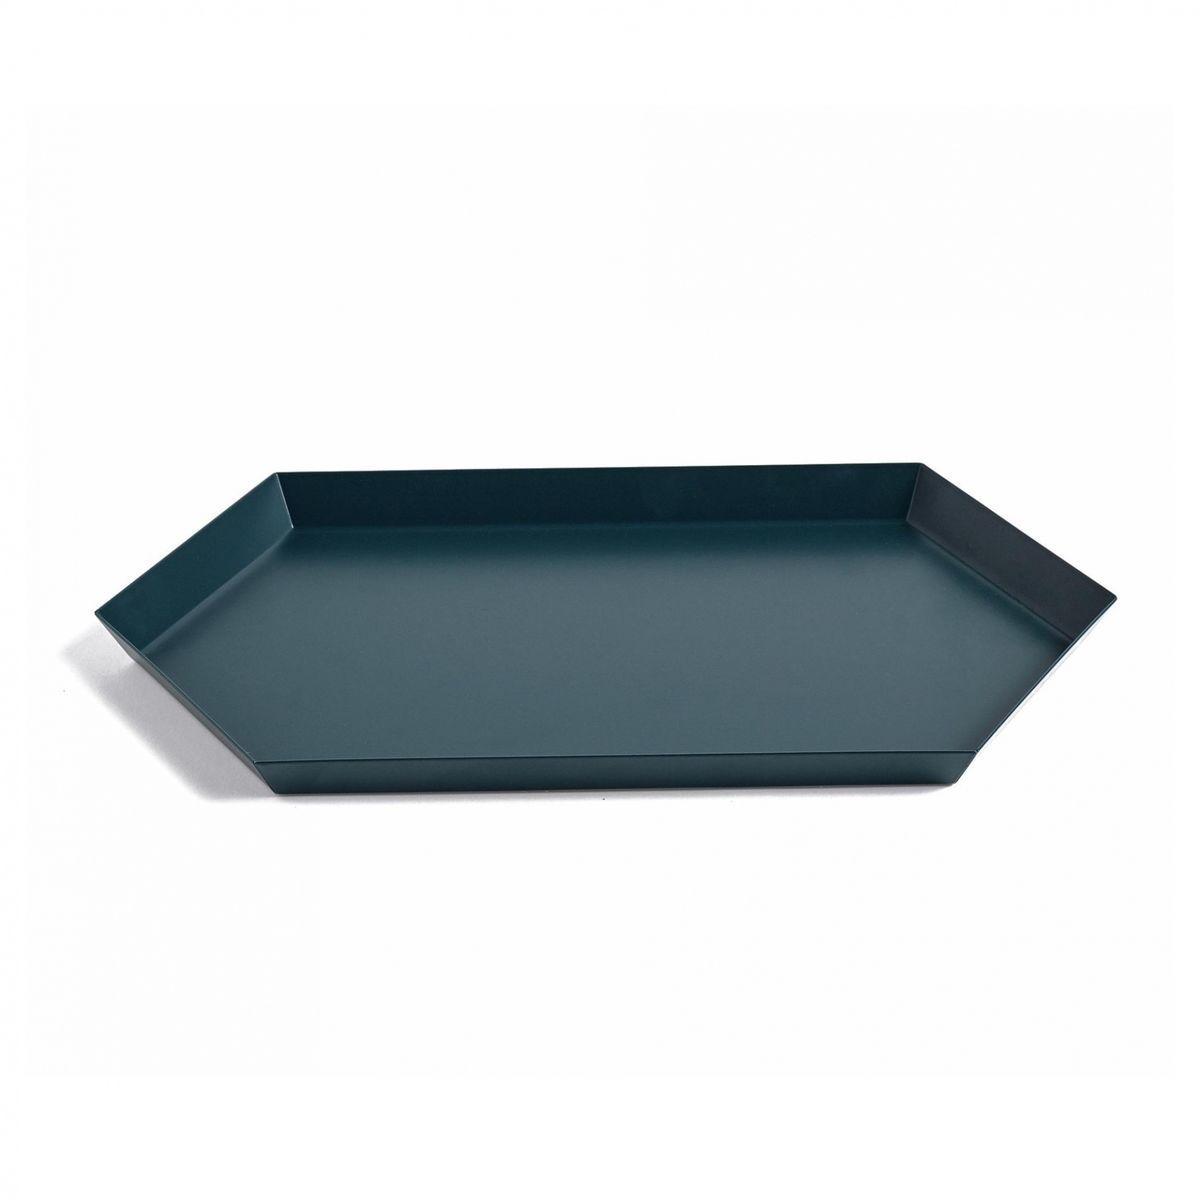 kaleido m tray hay. Black Bedroom Furniture Sets. Home Design Ideas